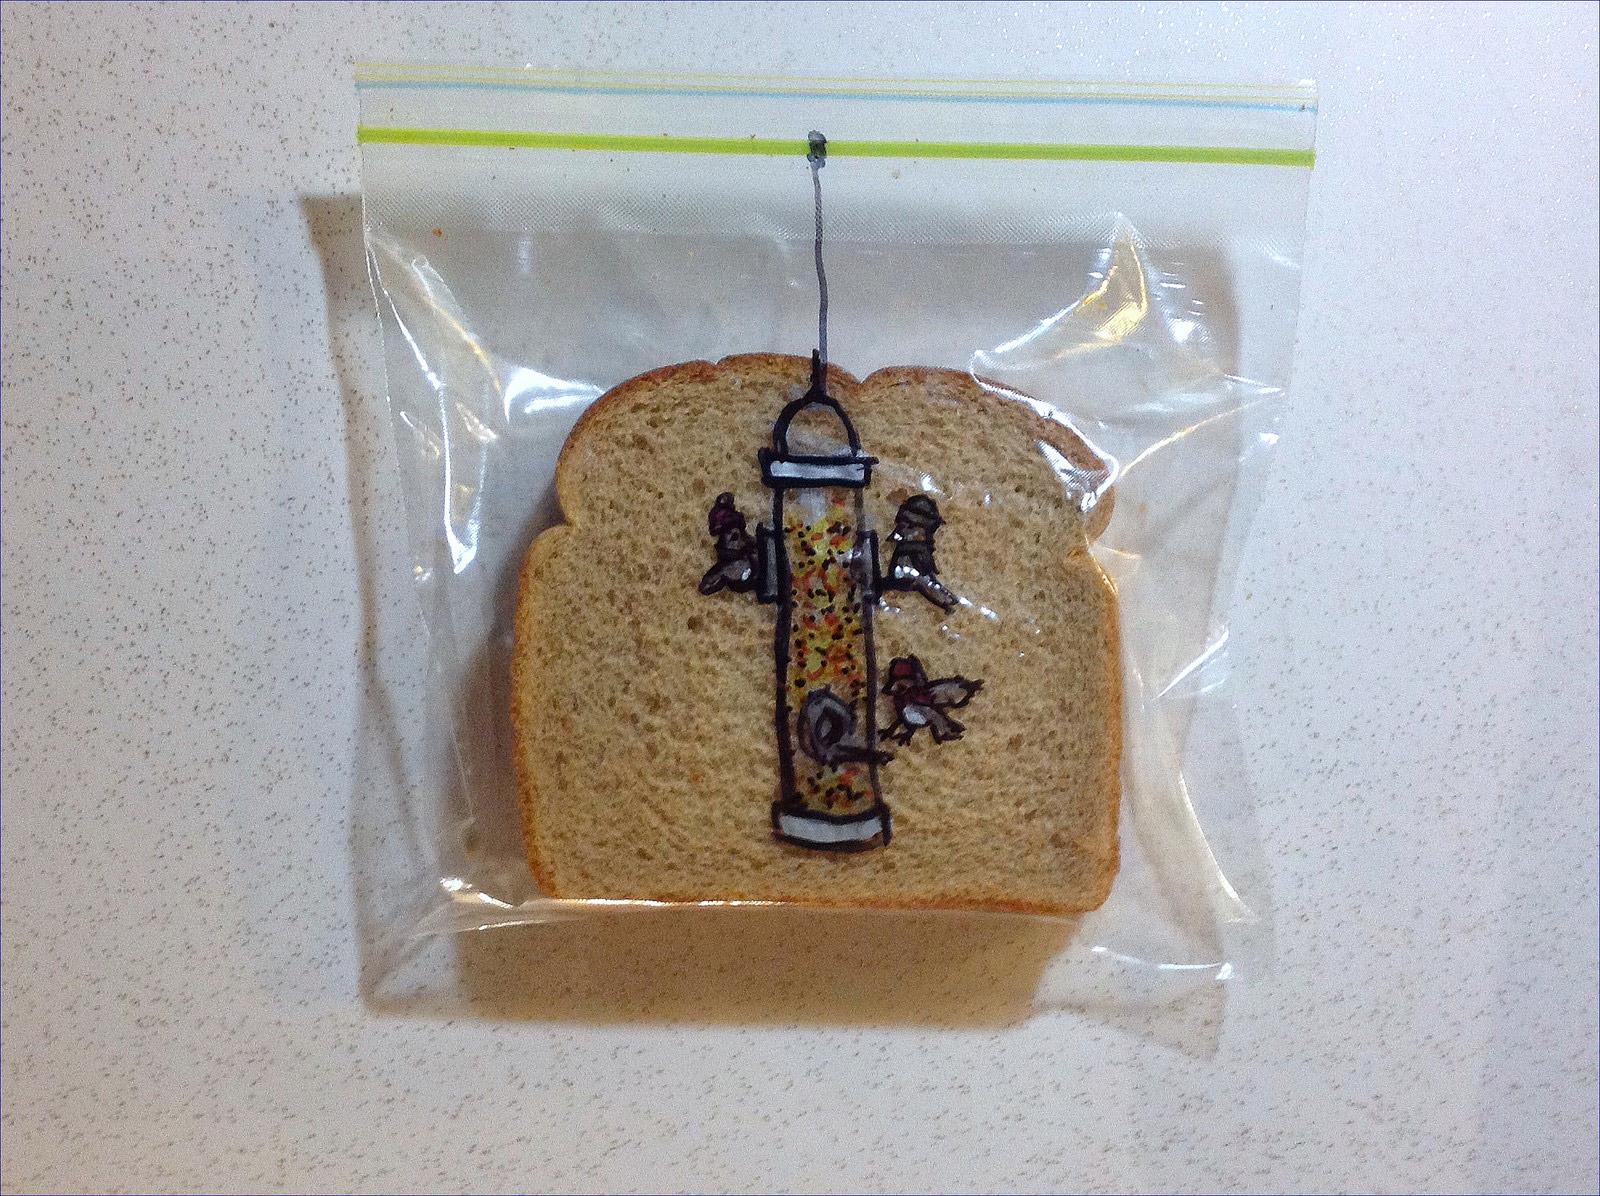 david-laferriere-creative-lunch-bag-illustration-07